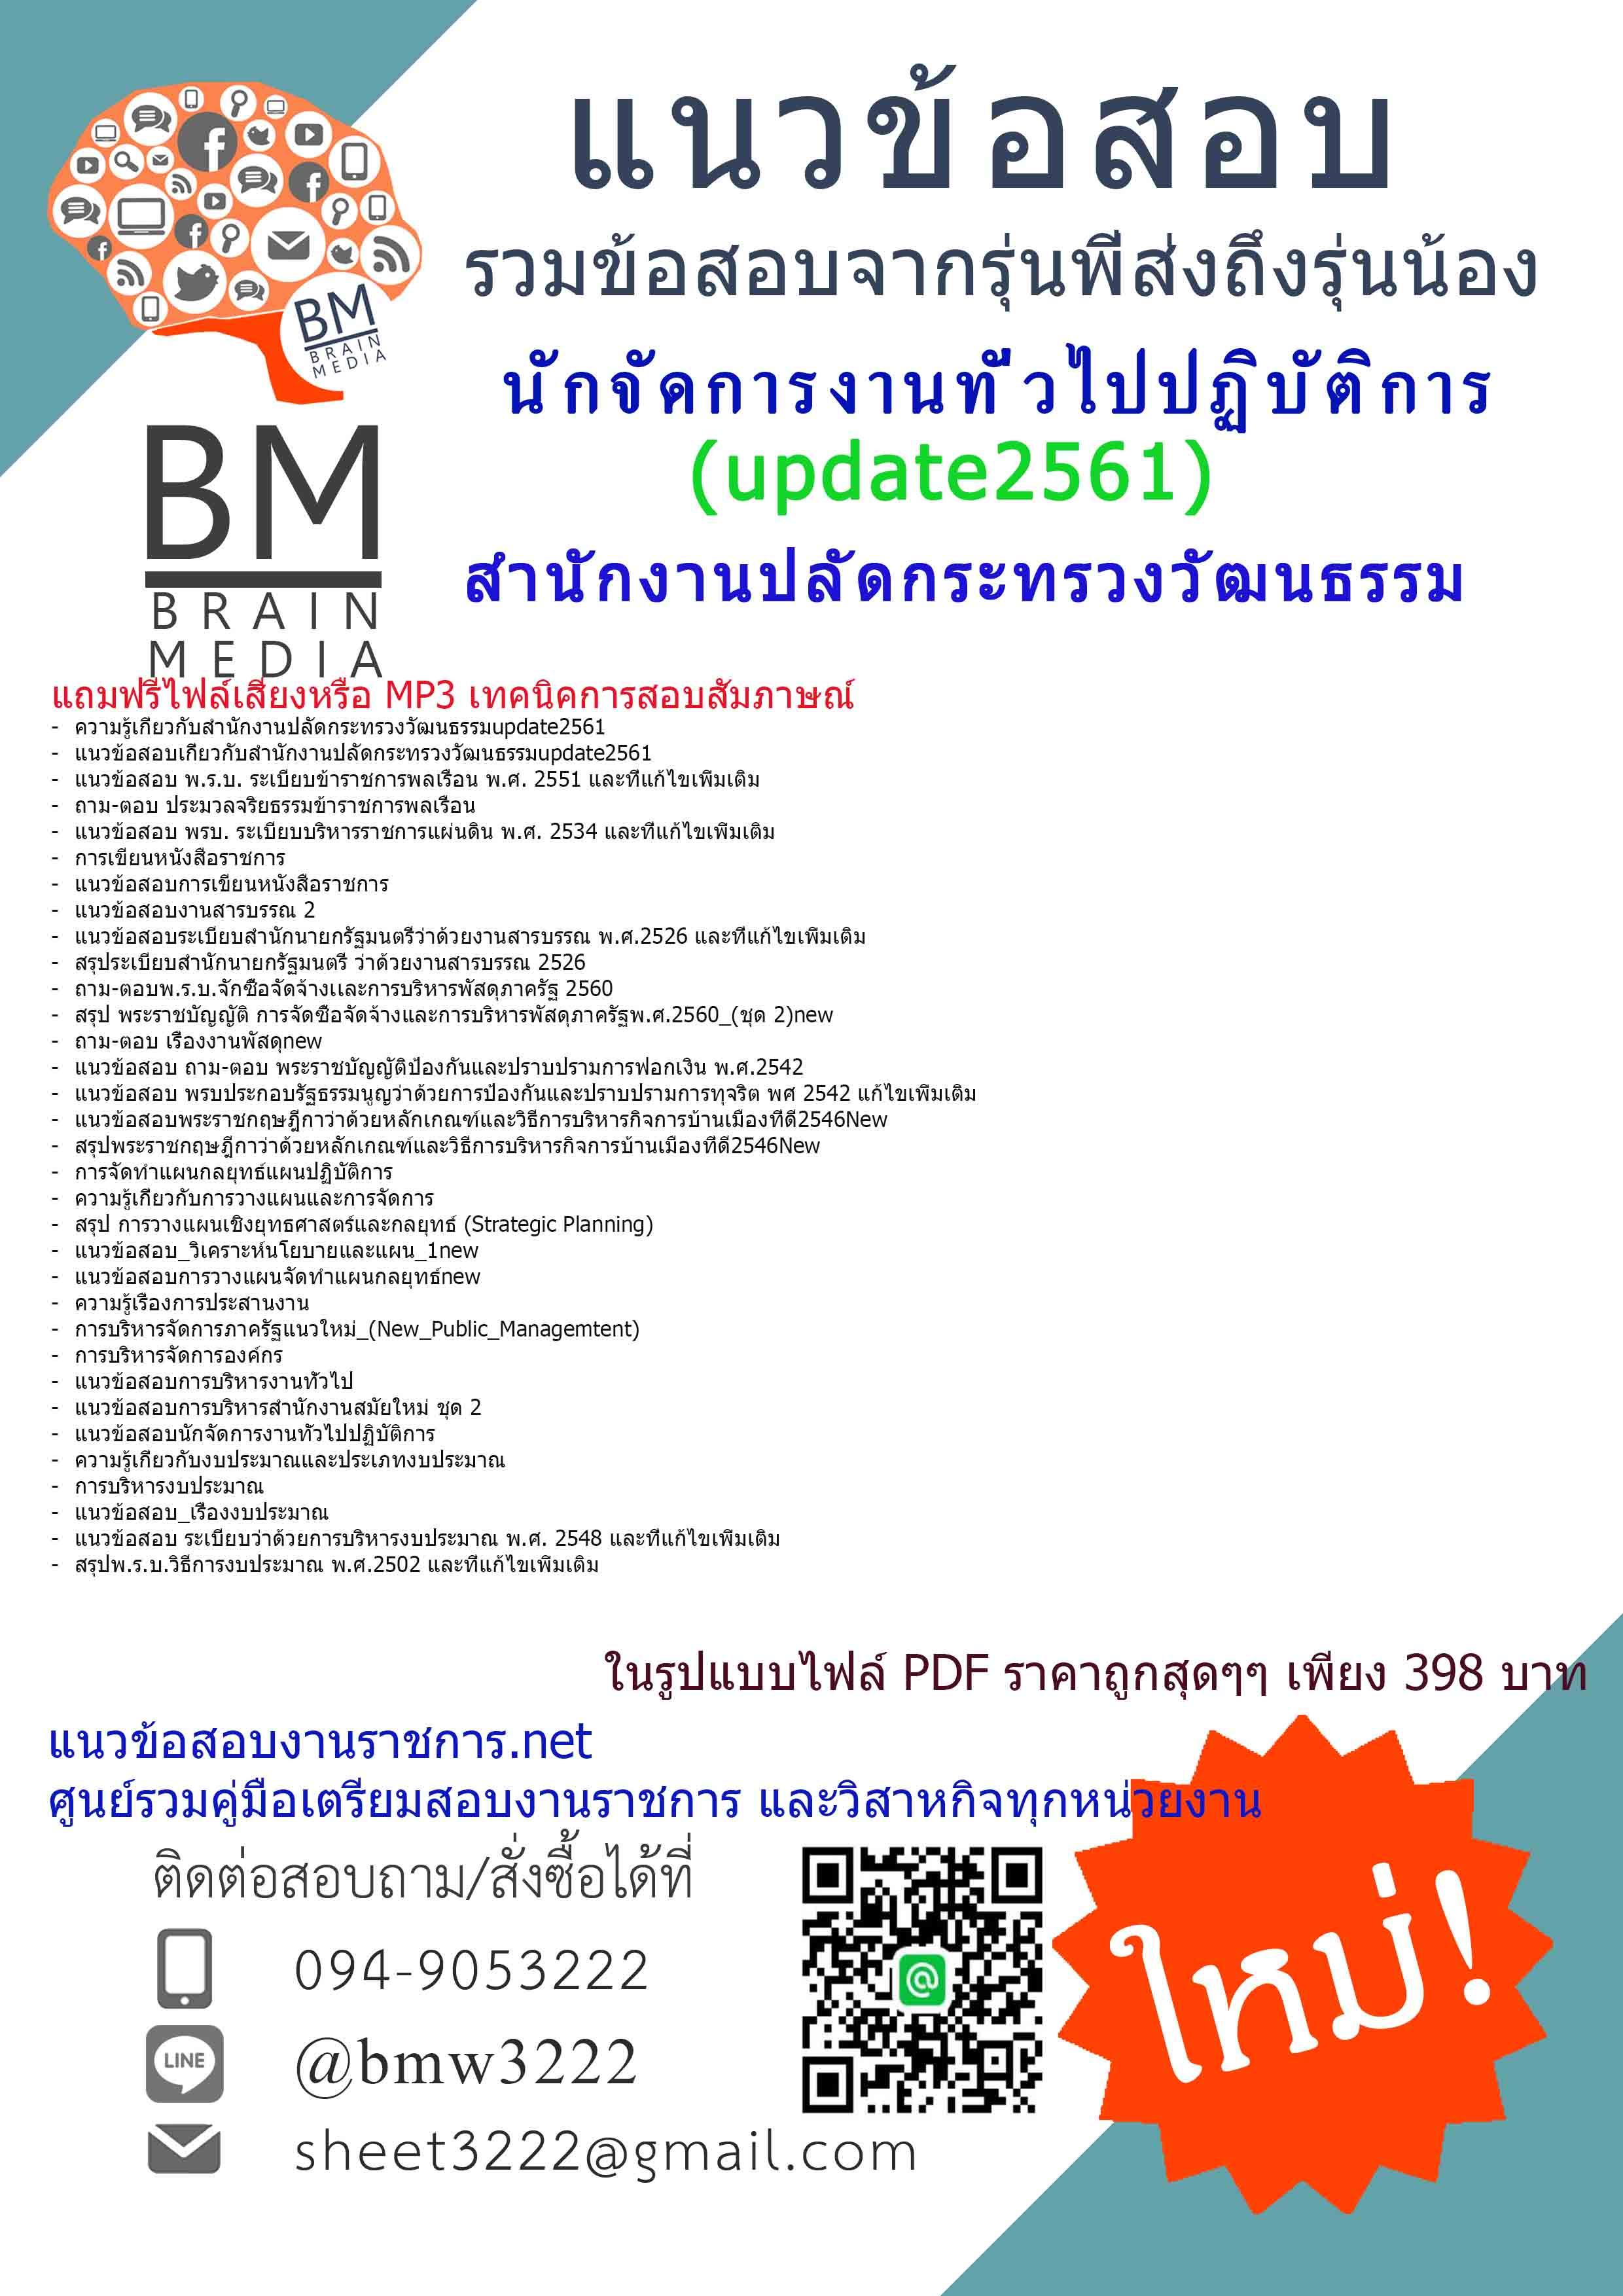 (((newupdateที่สุด)))แนวข้อสอบนักจัดการงานทั่วไปปฏิบัติการสำนักงานปลัดกระทรวงวัฒนธรรม2561